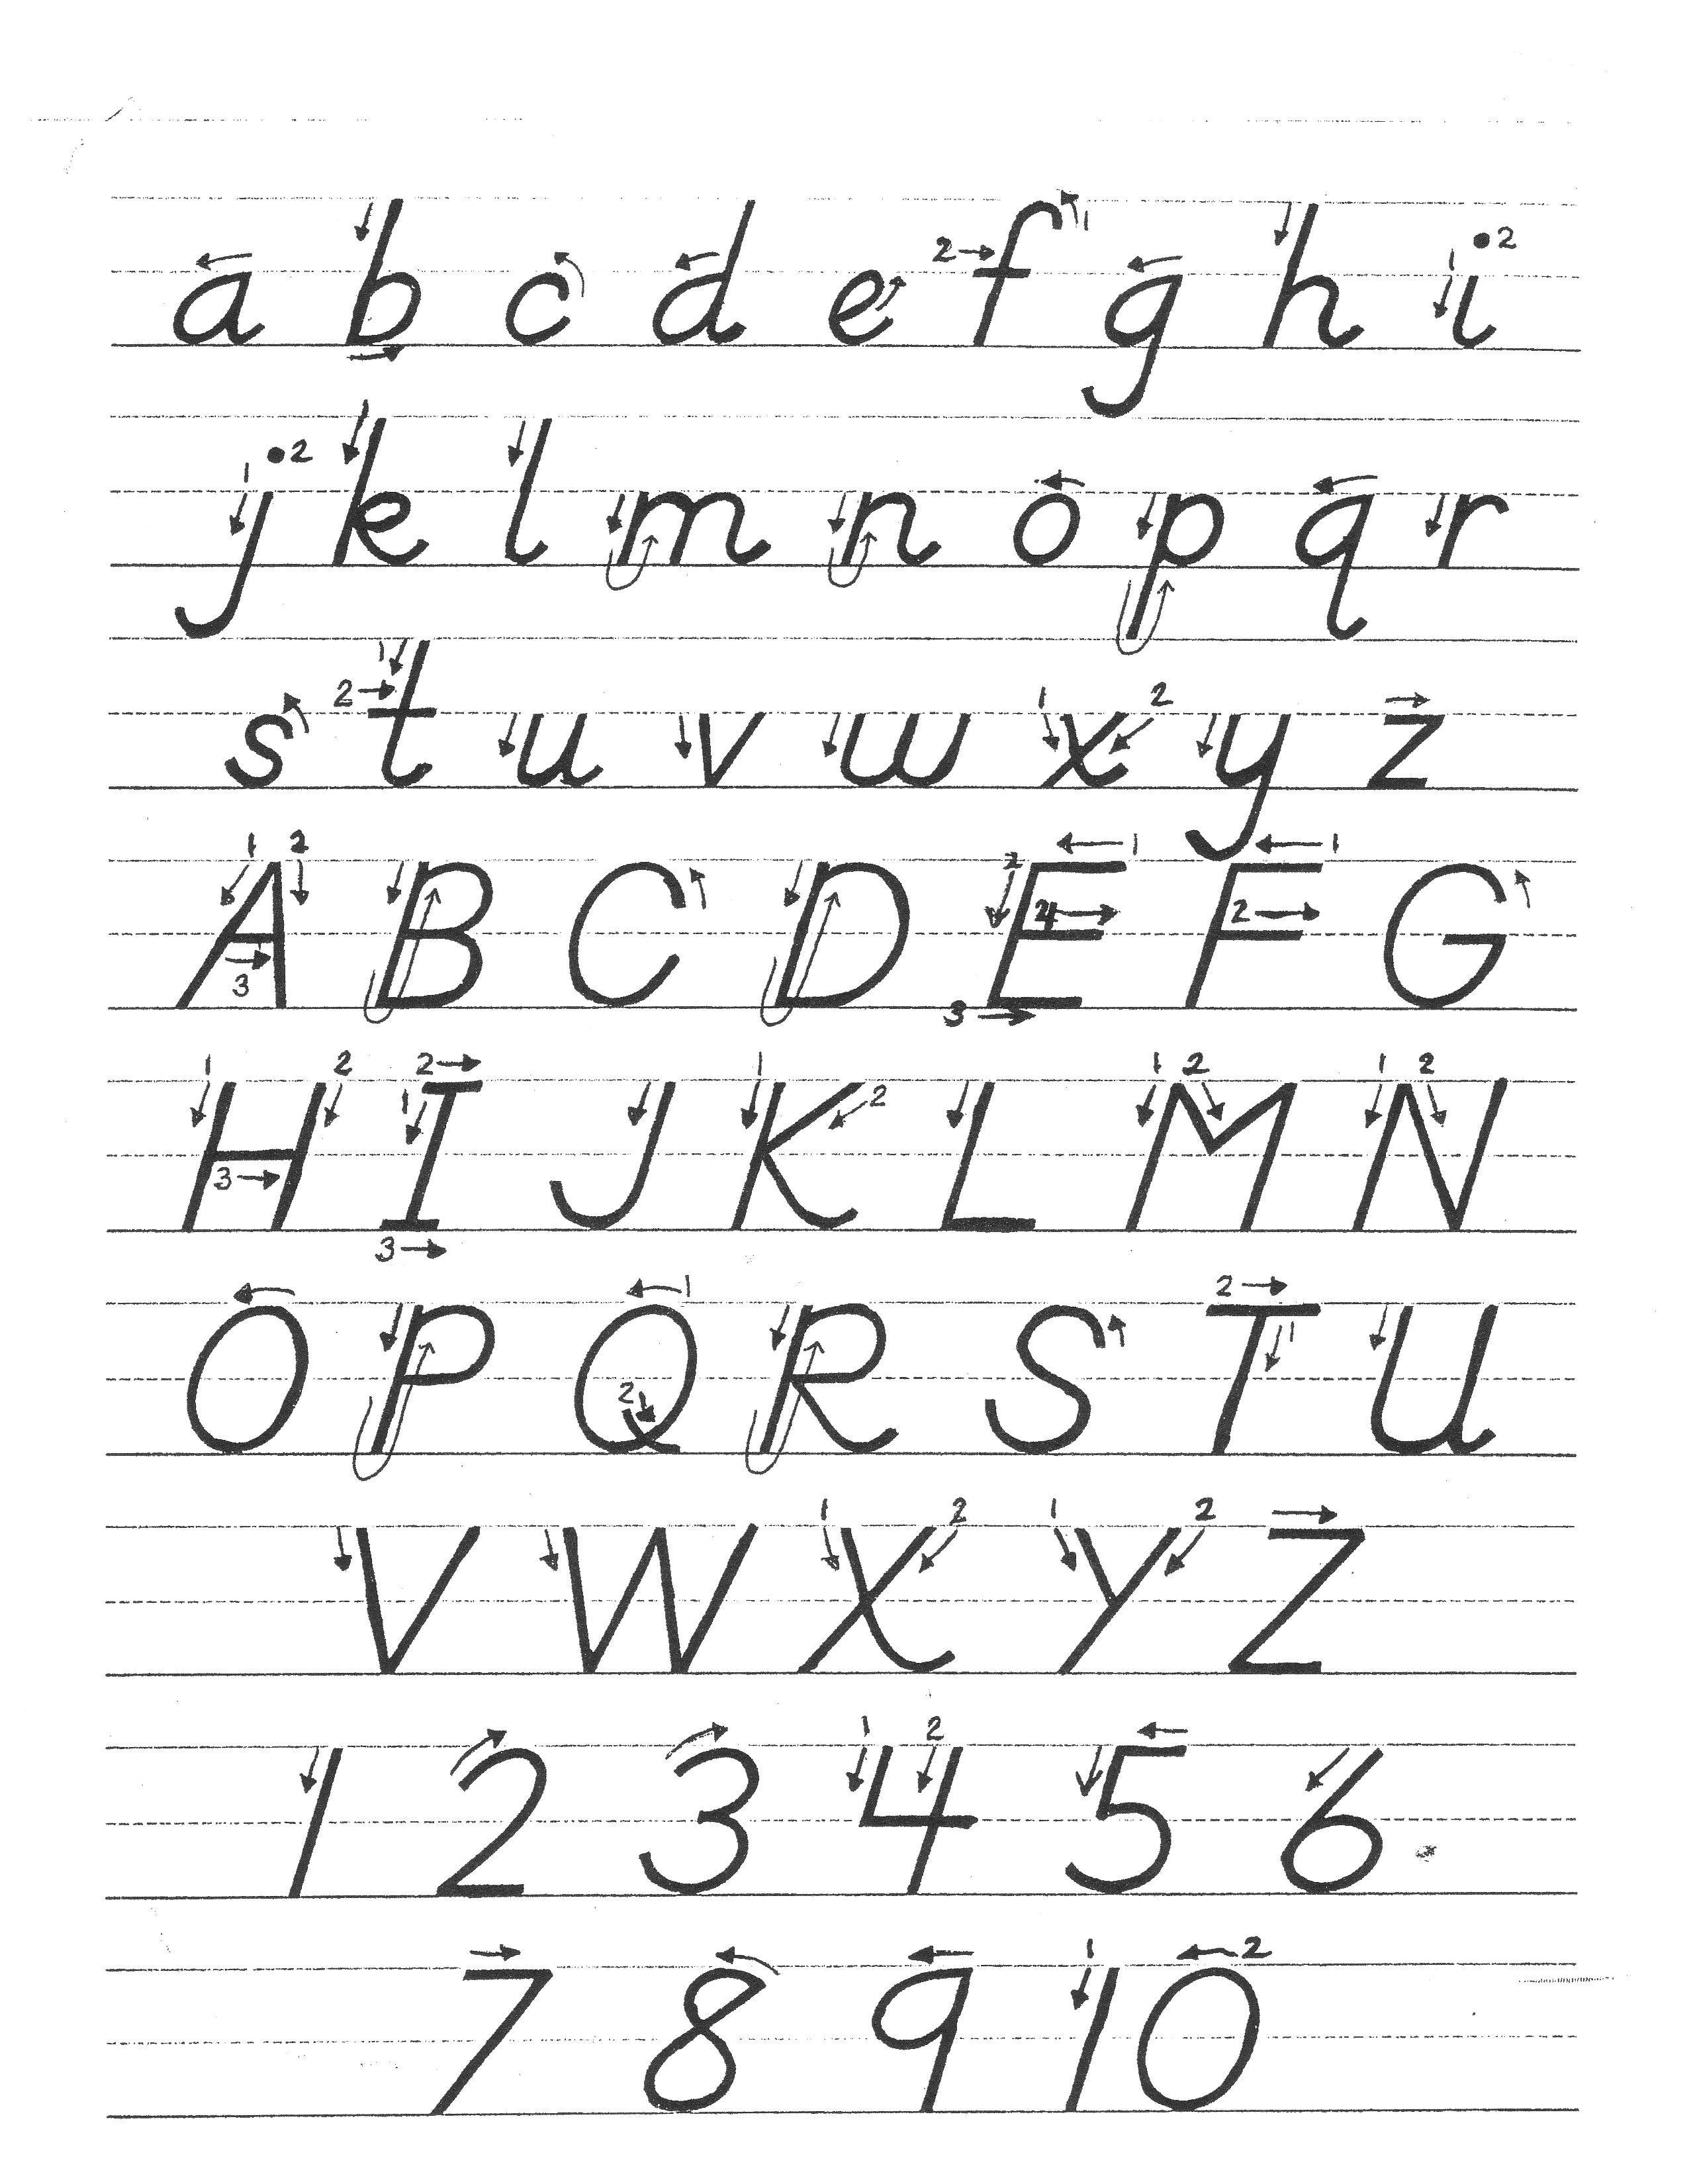 Nelson Handwriting Alphabet Poster